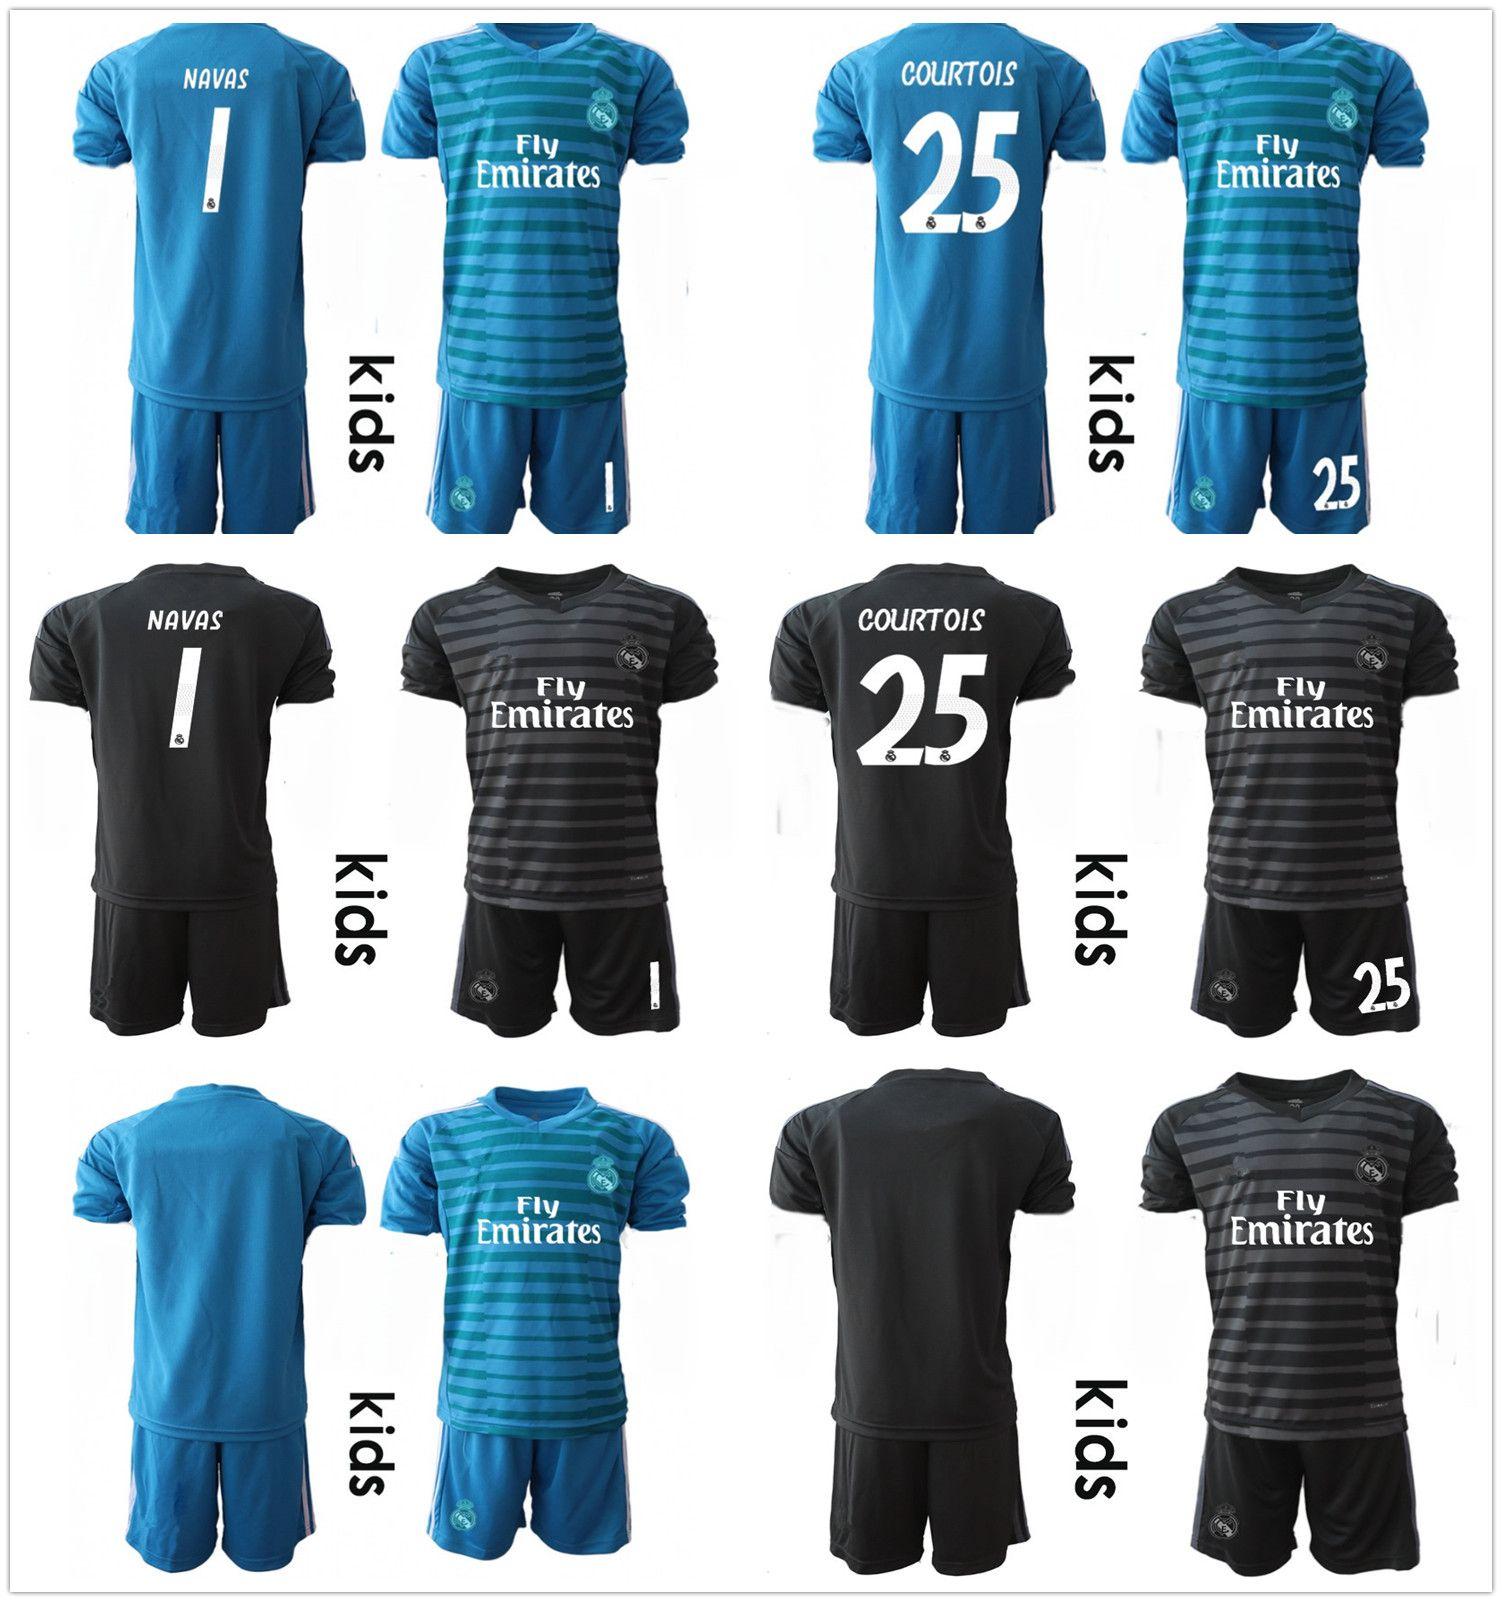 dac6a03b5 purchase 2018 2018 2019 kid youth short real madrid soccer set goalkeeper  kit blue black keylor